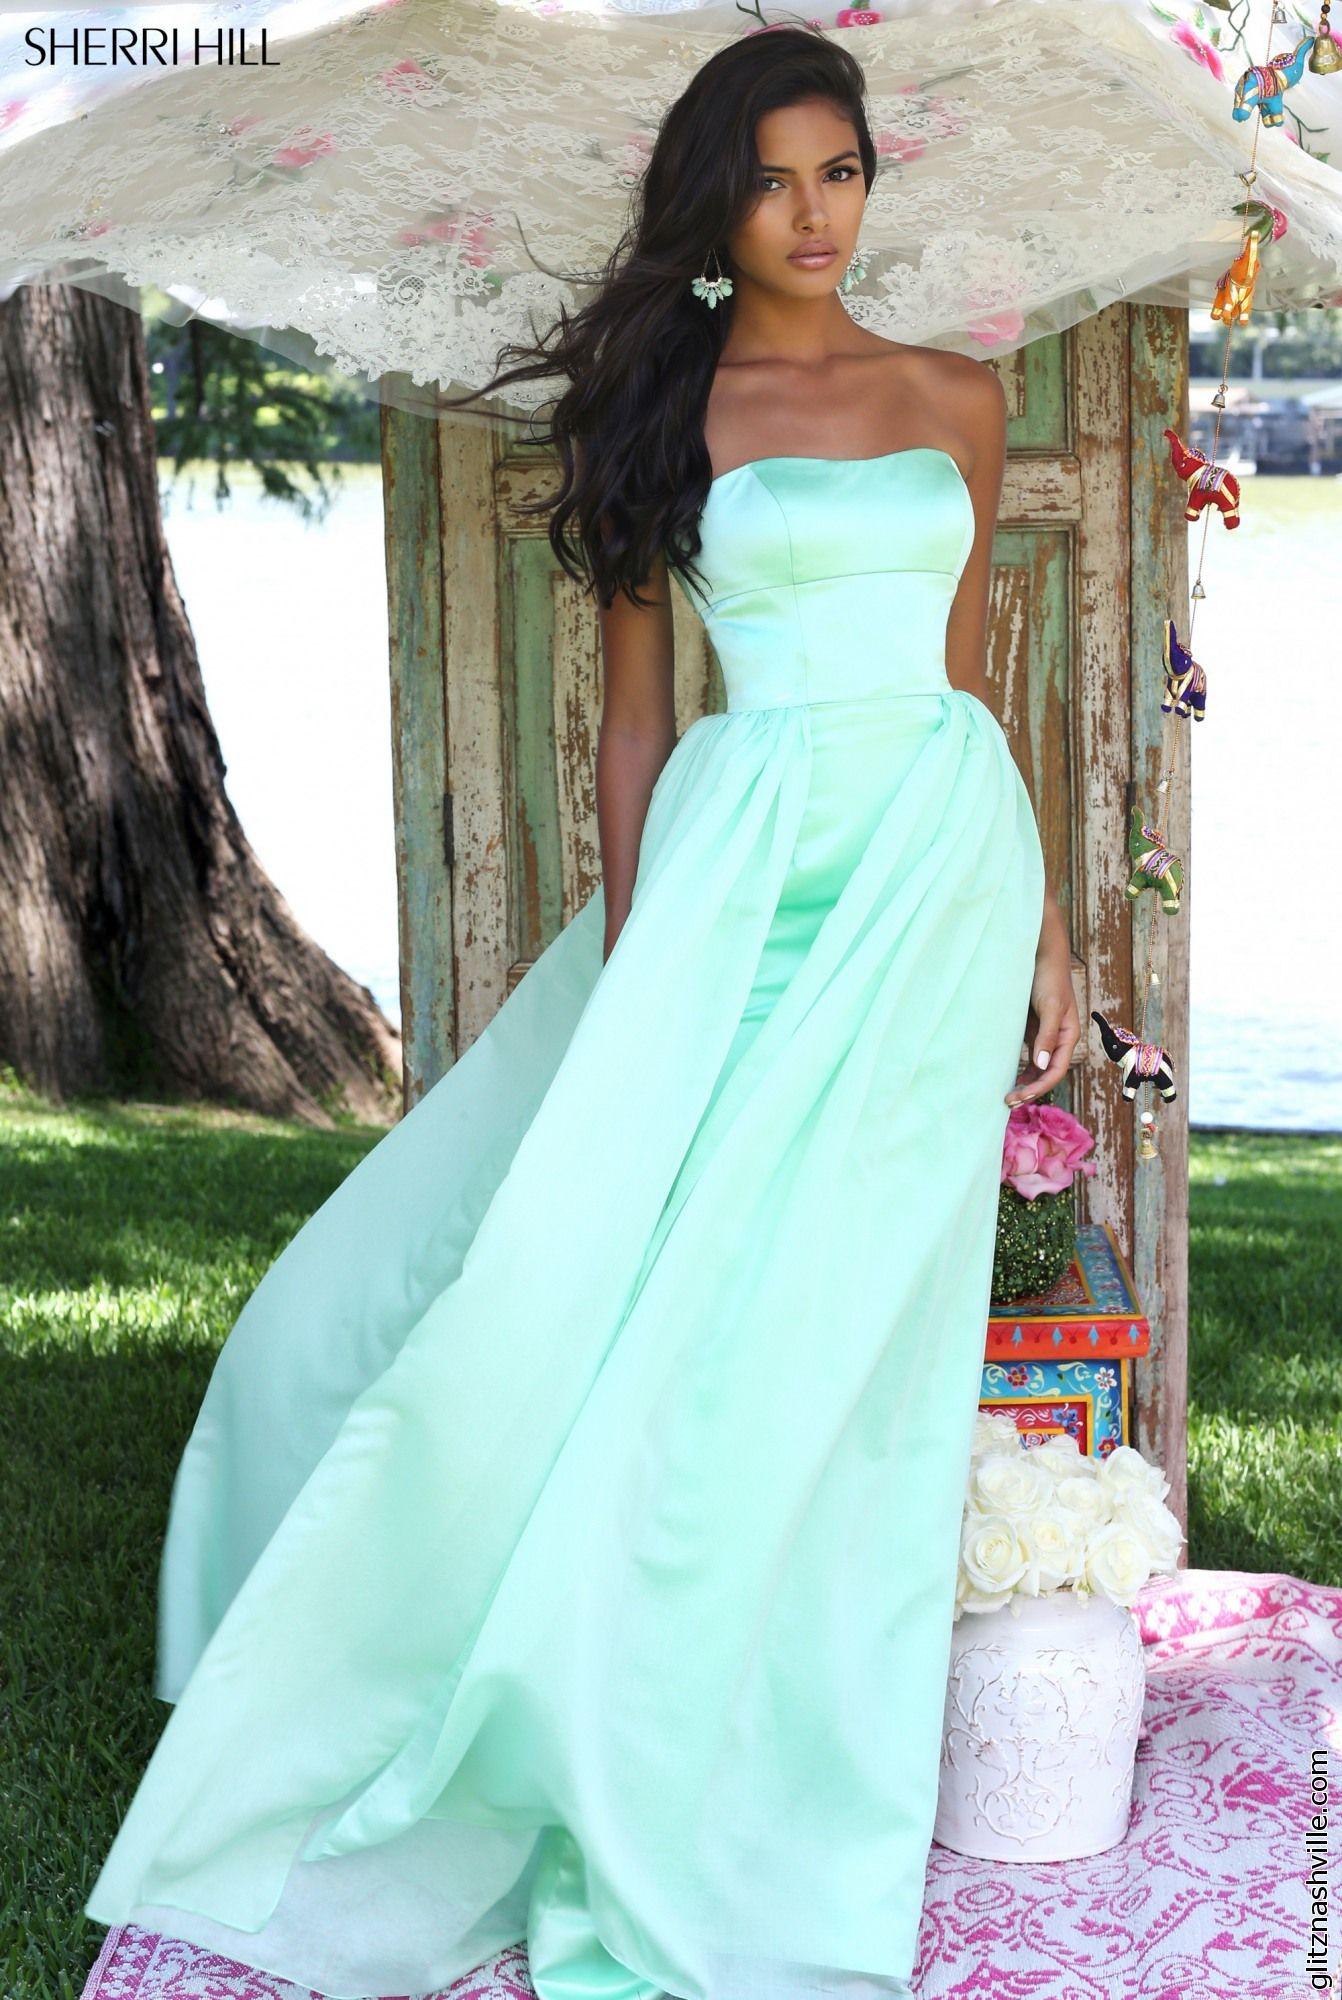 Pin by Glitz Nashville on Prom/Social: Sherri Hill | Pinterest ...